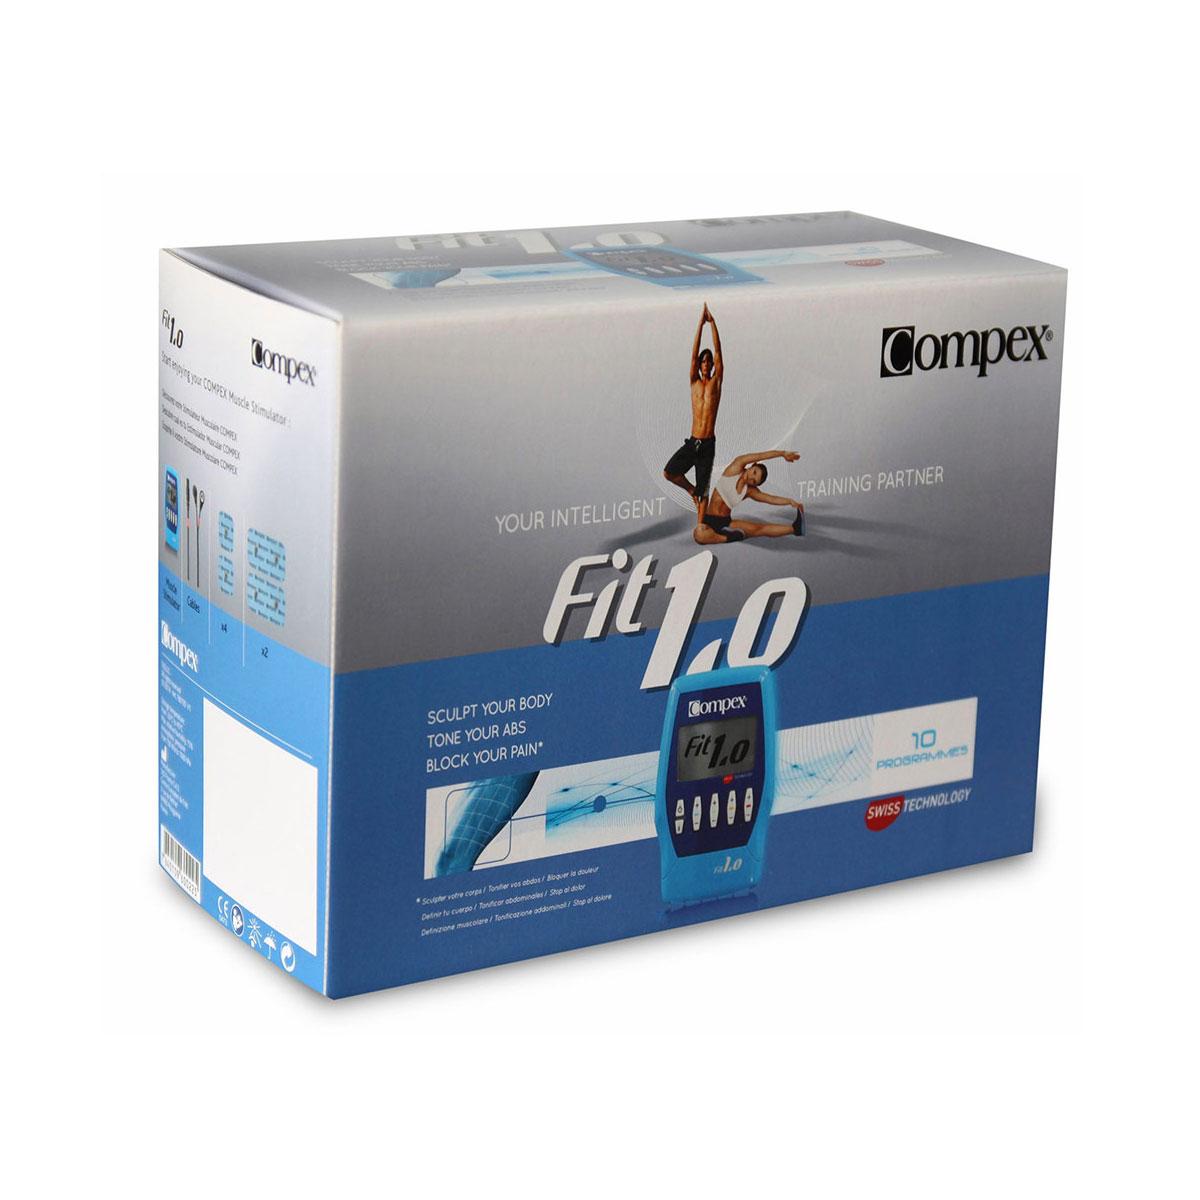 Elektrostymulator Compex FIT 1.0 karton